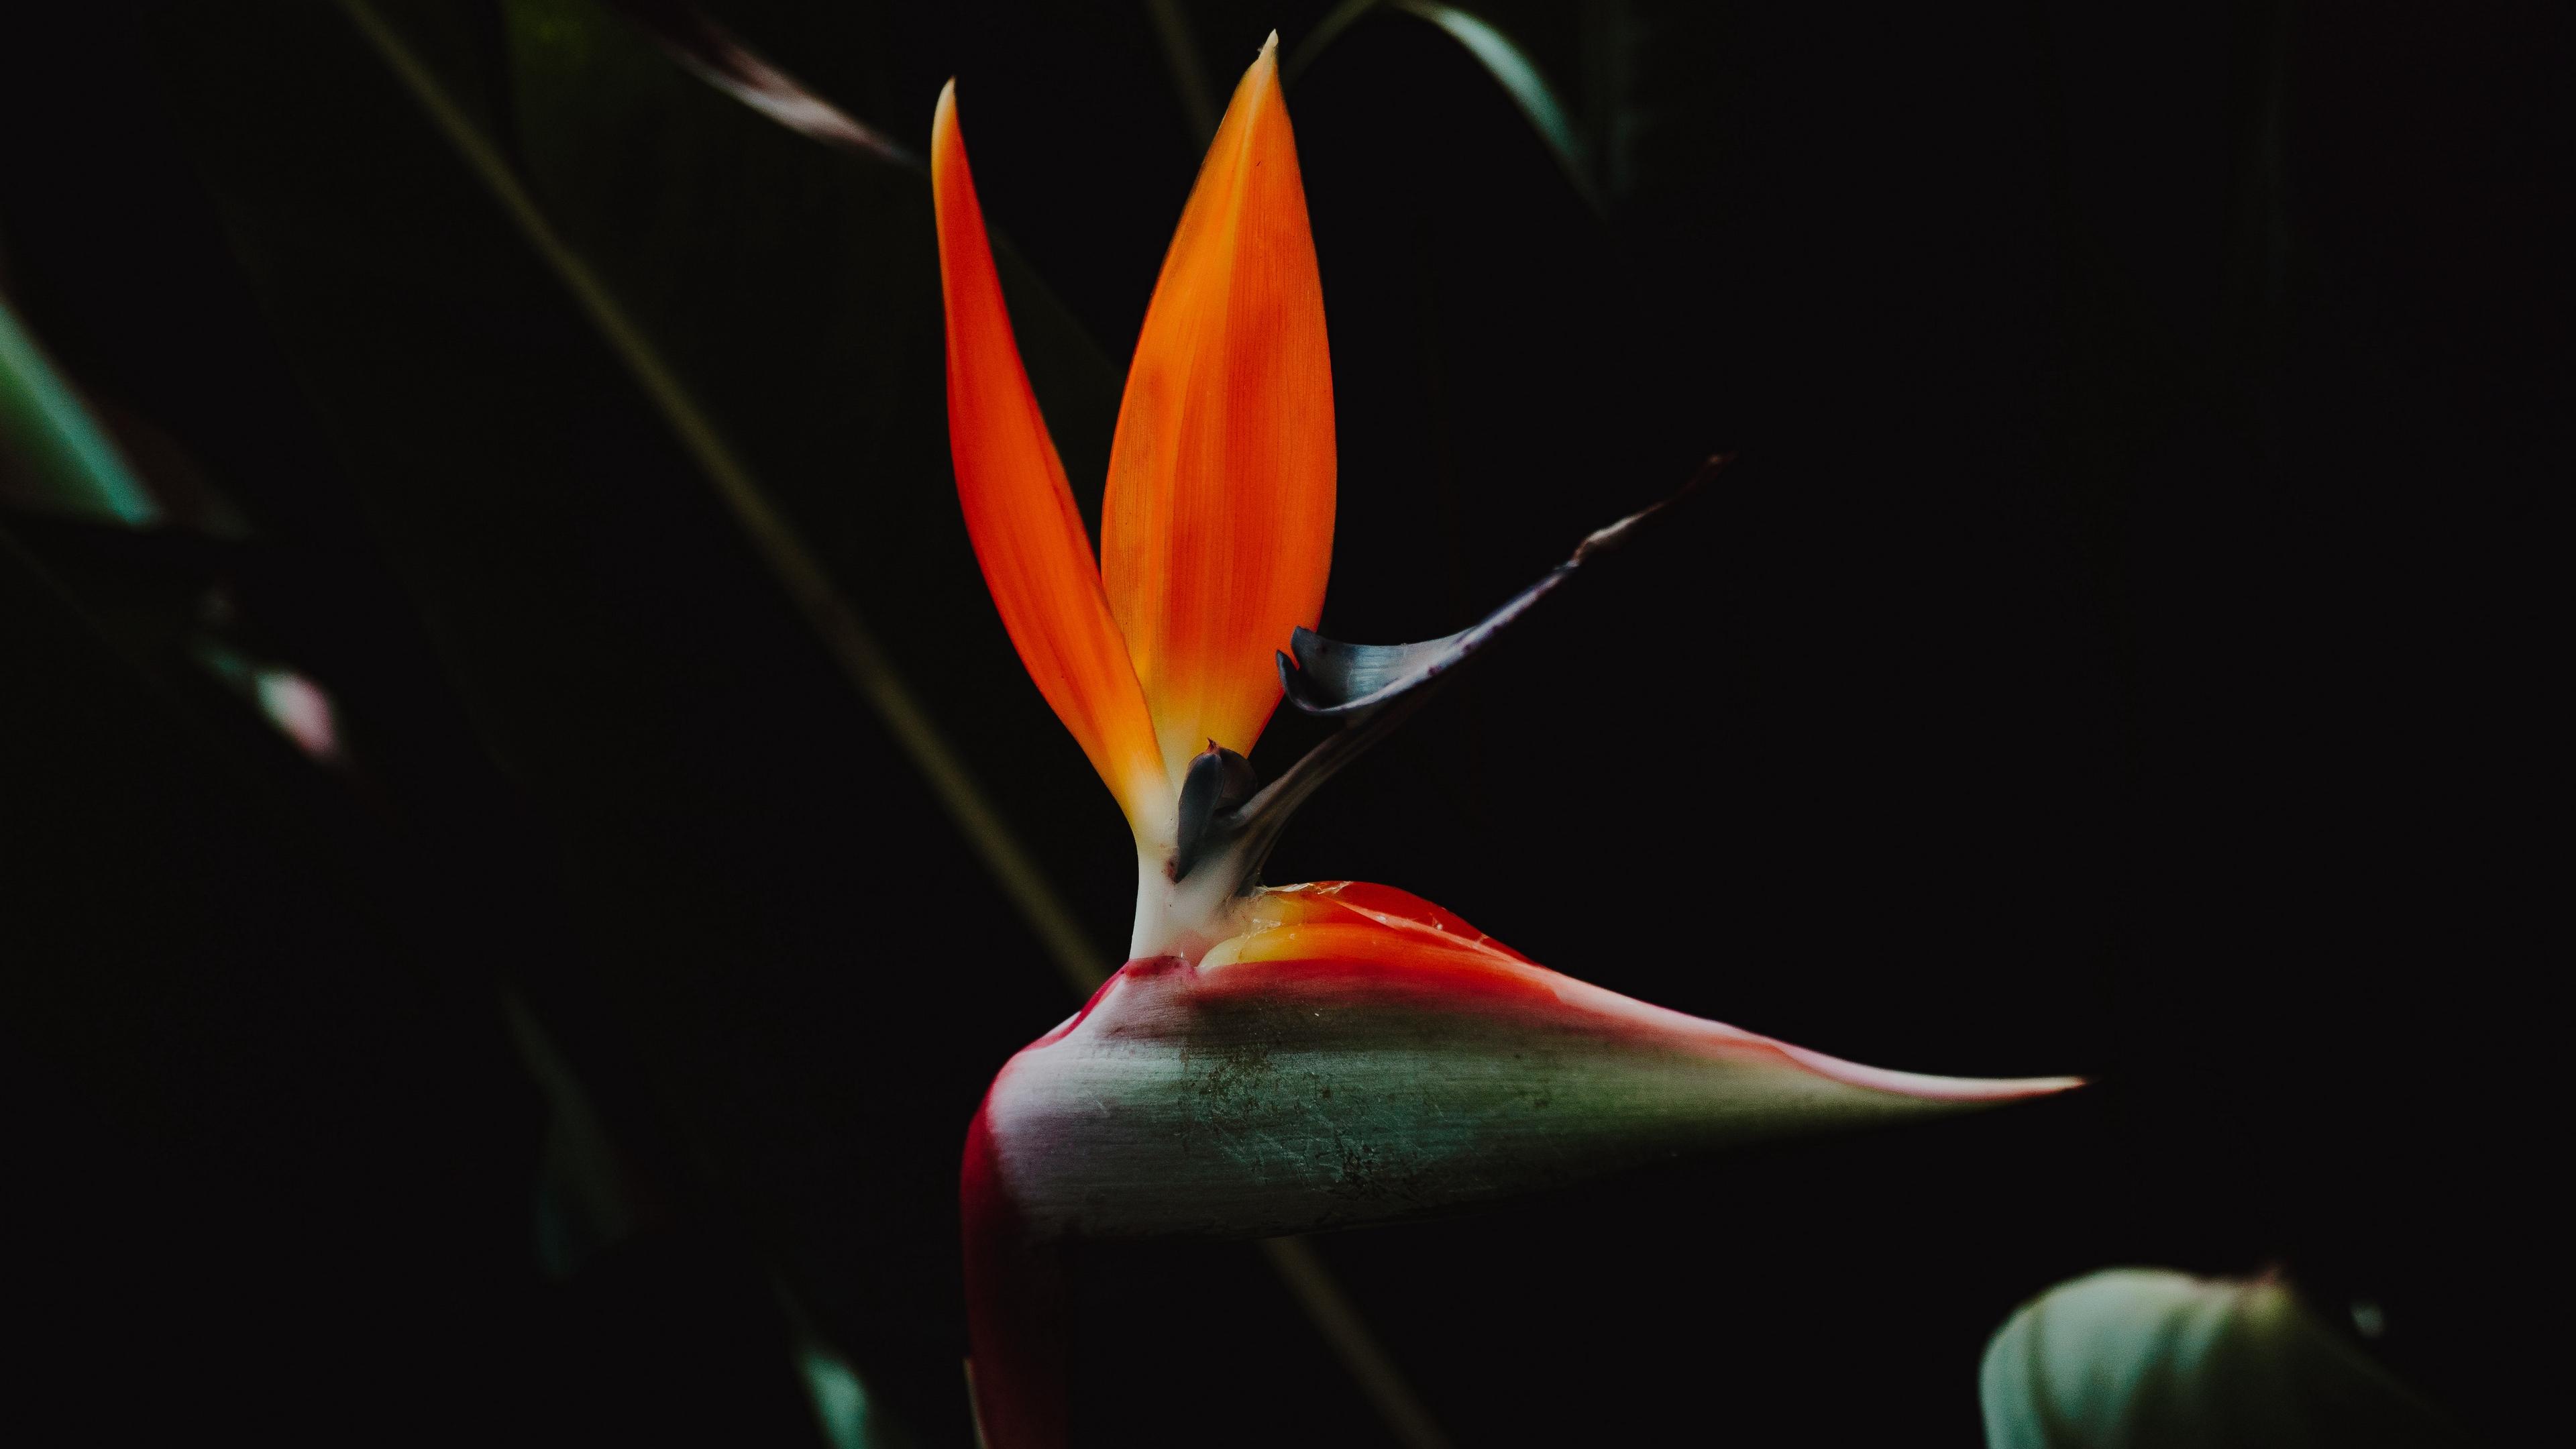 strelitzia bird of paradise flower flower petals 4k 1540575114 - strelitzia, bird of paradise flower, flower, petals 4k - strelitzia, flower, bird of paradise flower